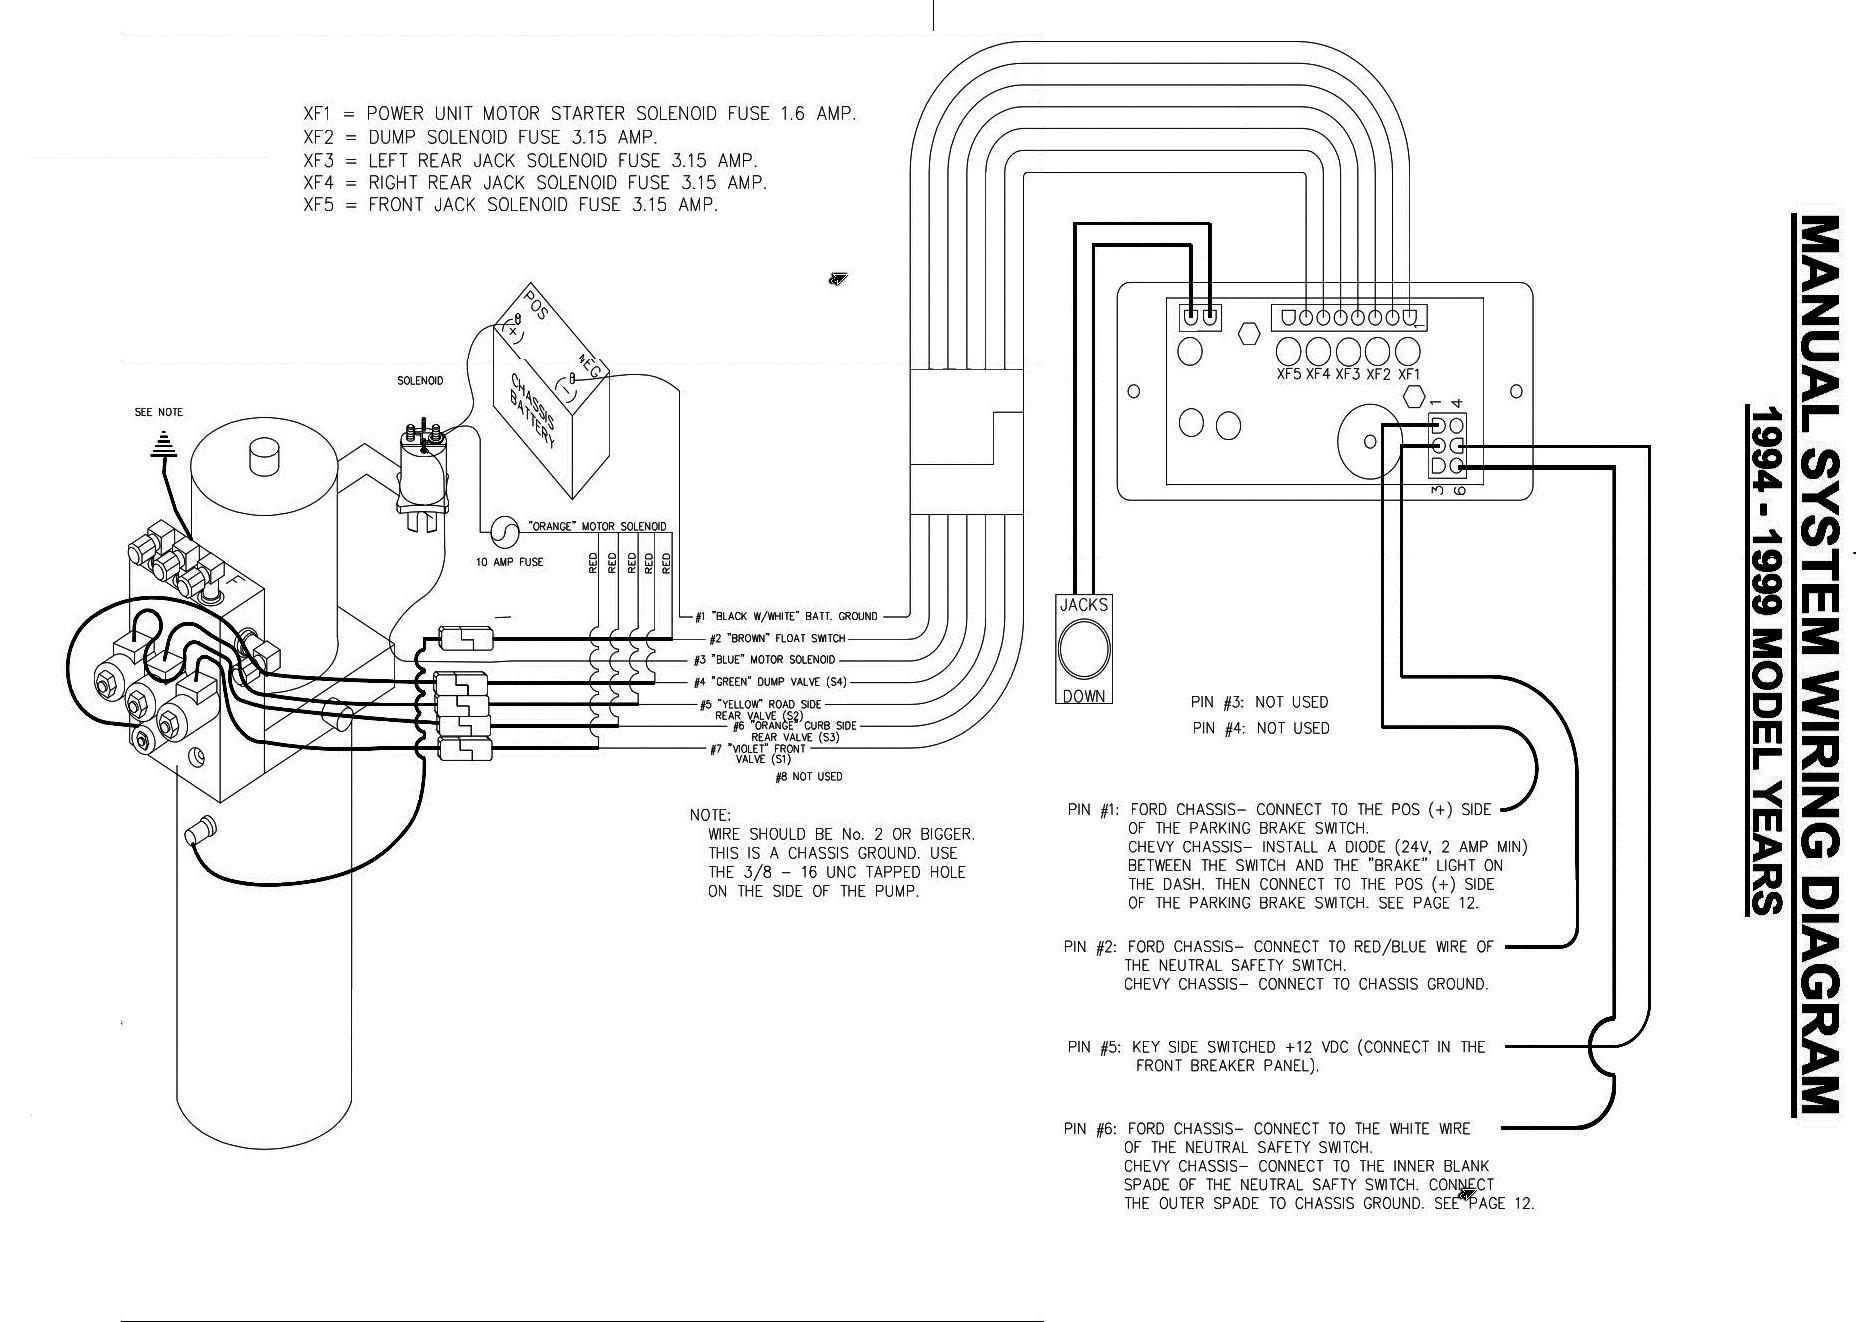 Addition 1994 Vw Jetta Wiring Diagram On 1979 Scirocco Wiring Diagram